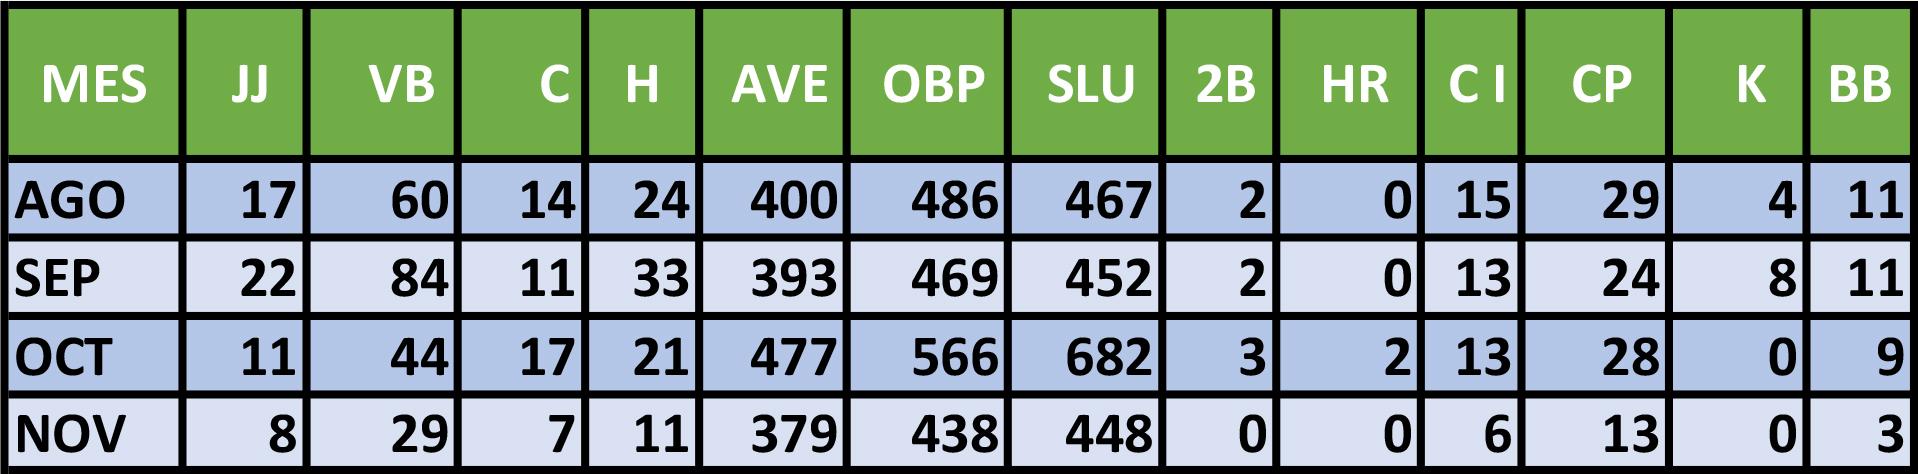 Estadísticas de Jhonson en la presente Serie Nacional de la pelota cubana.